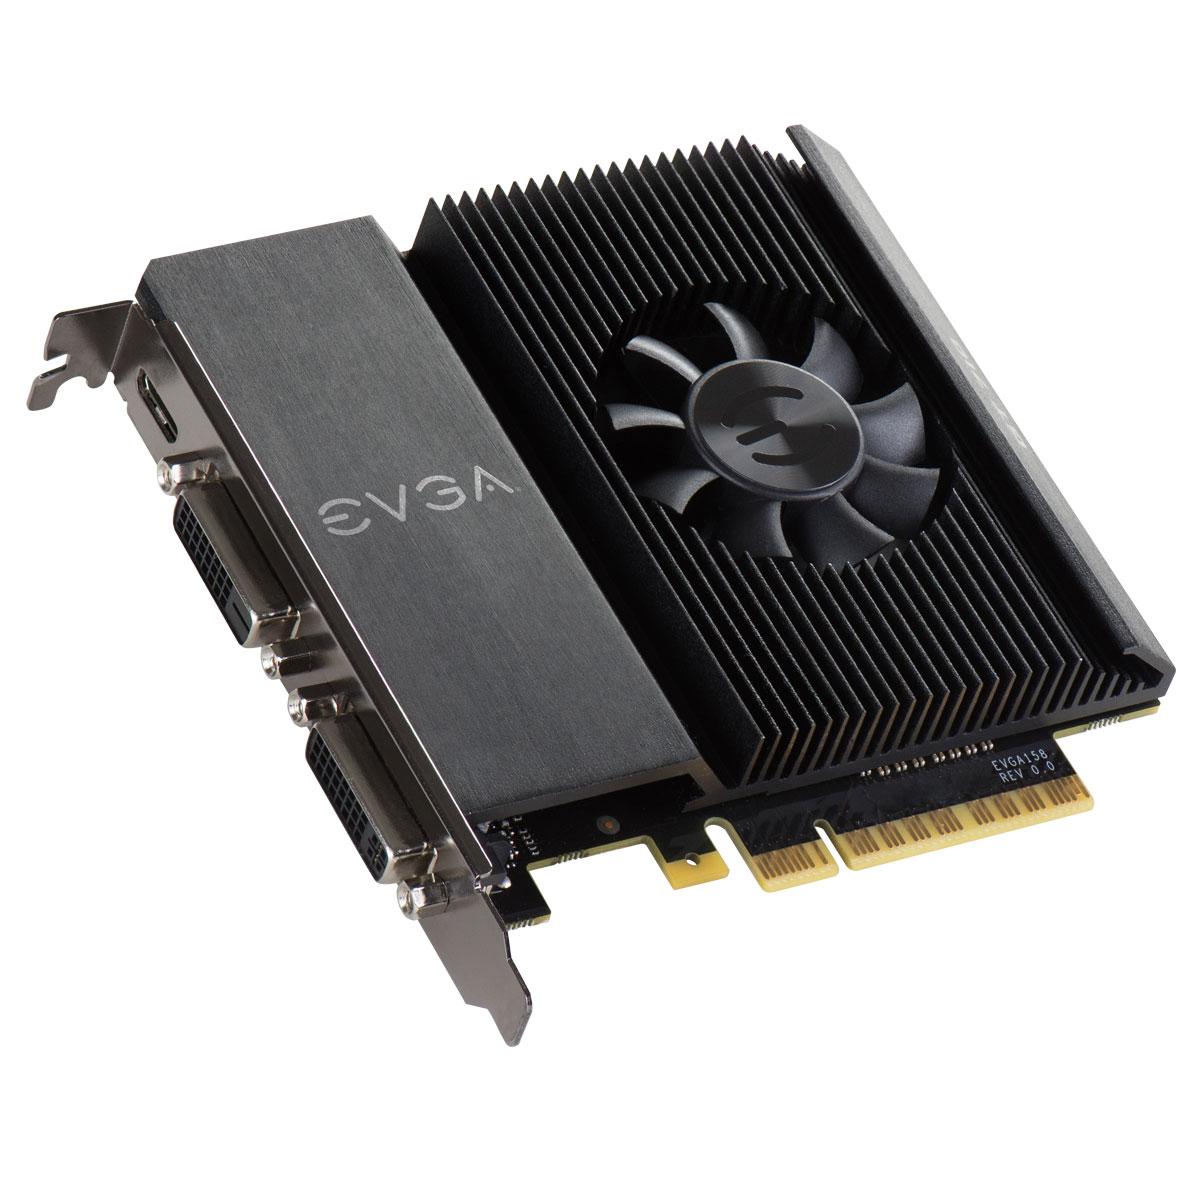 EVGA Geforce GT 710 dual-DVI